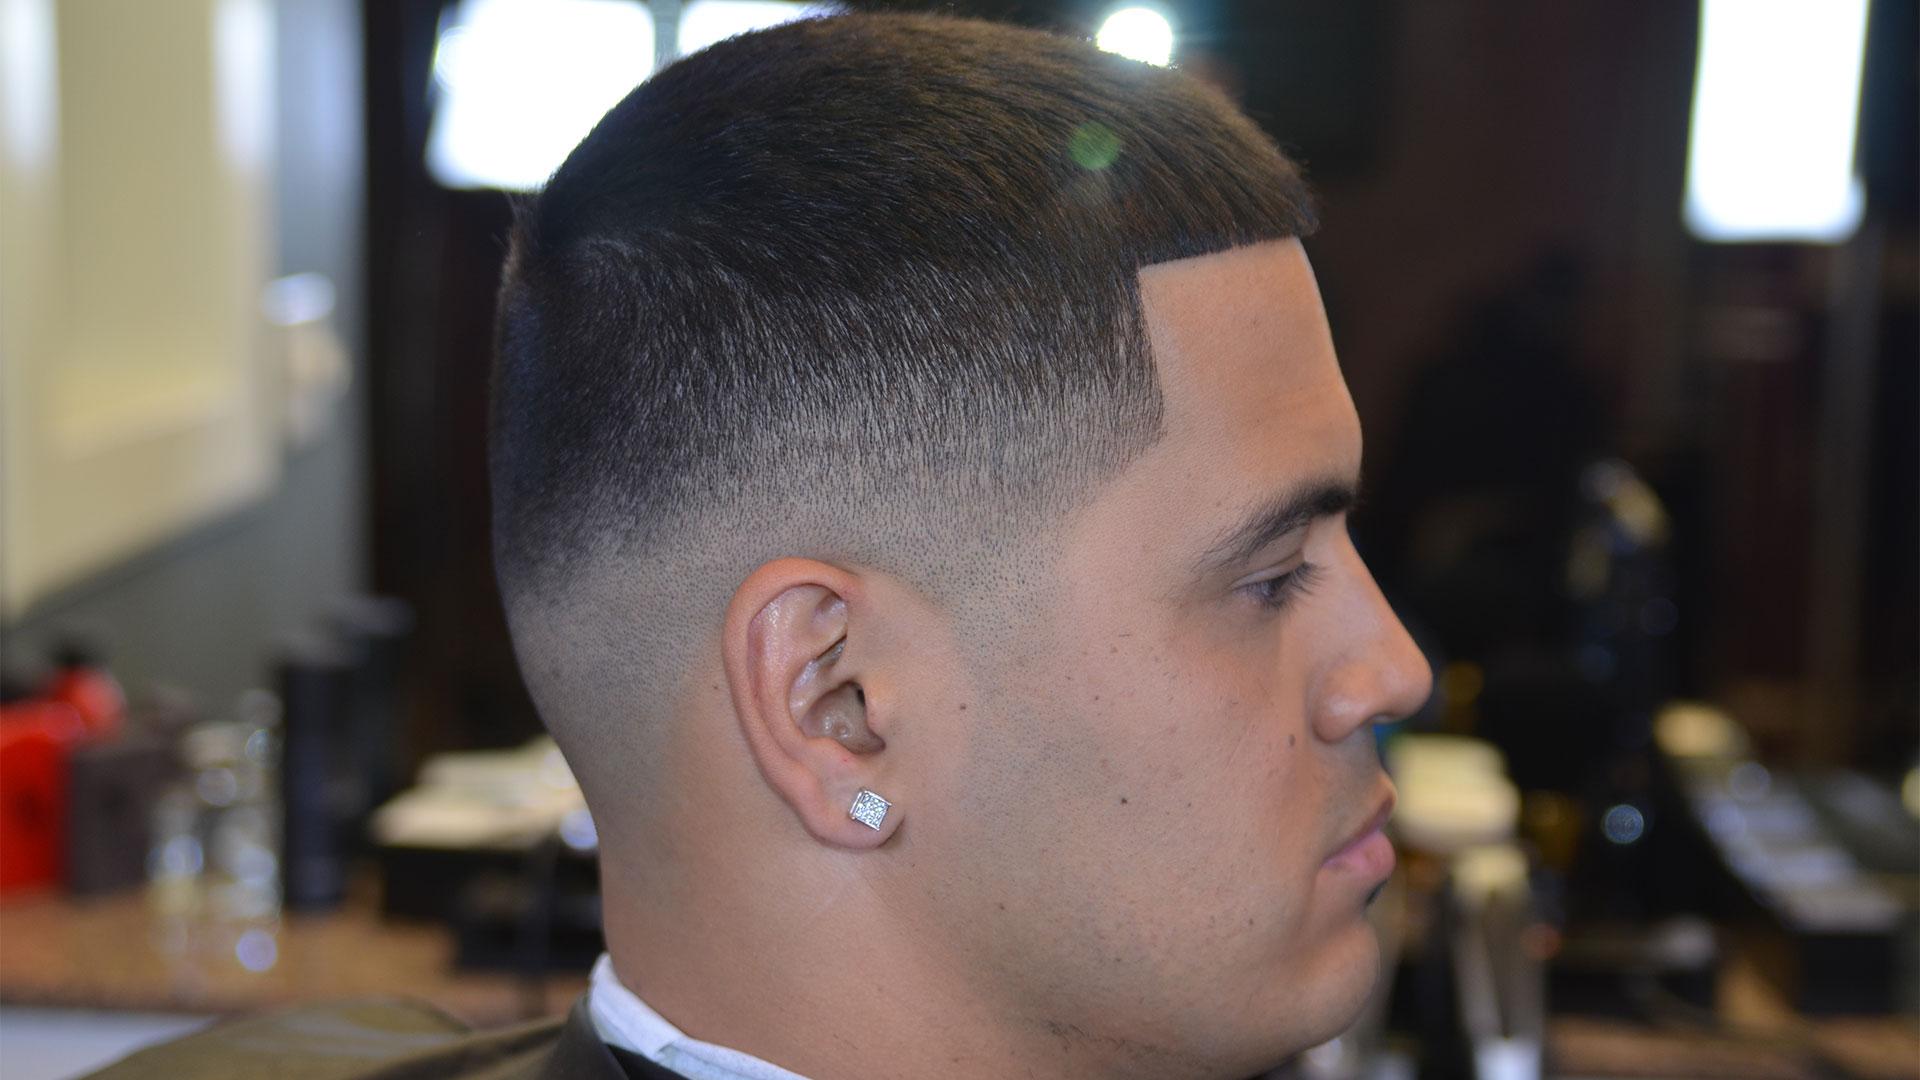 6 Mid Bald Fade Latin Hair Dave Diggs Online Barber